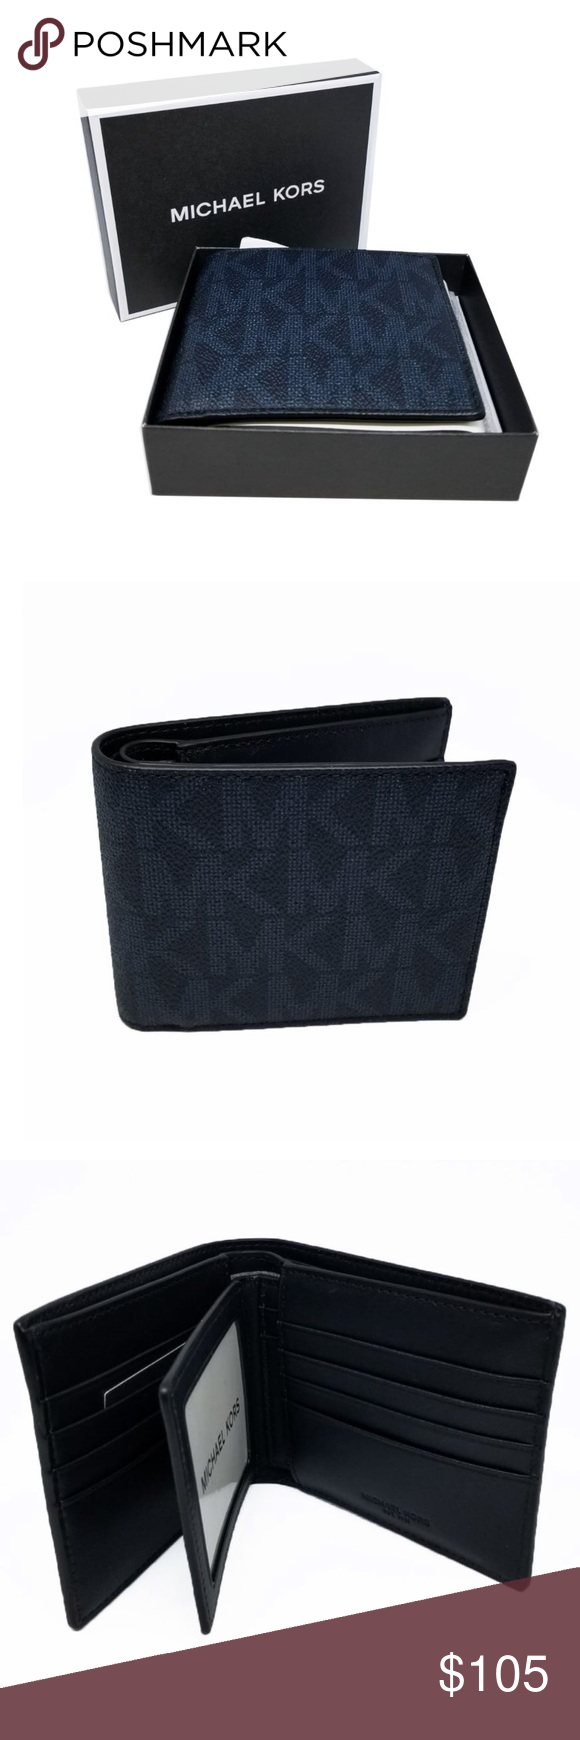 ed61f25d1055 Michael Kors Jet Set Men's Billfold/Passcase Men's bifold wallet with  subtle blue monogram print